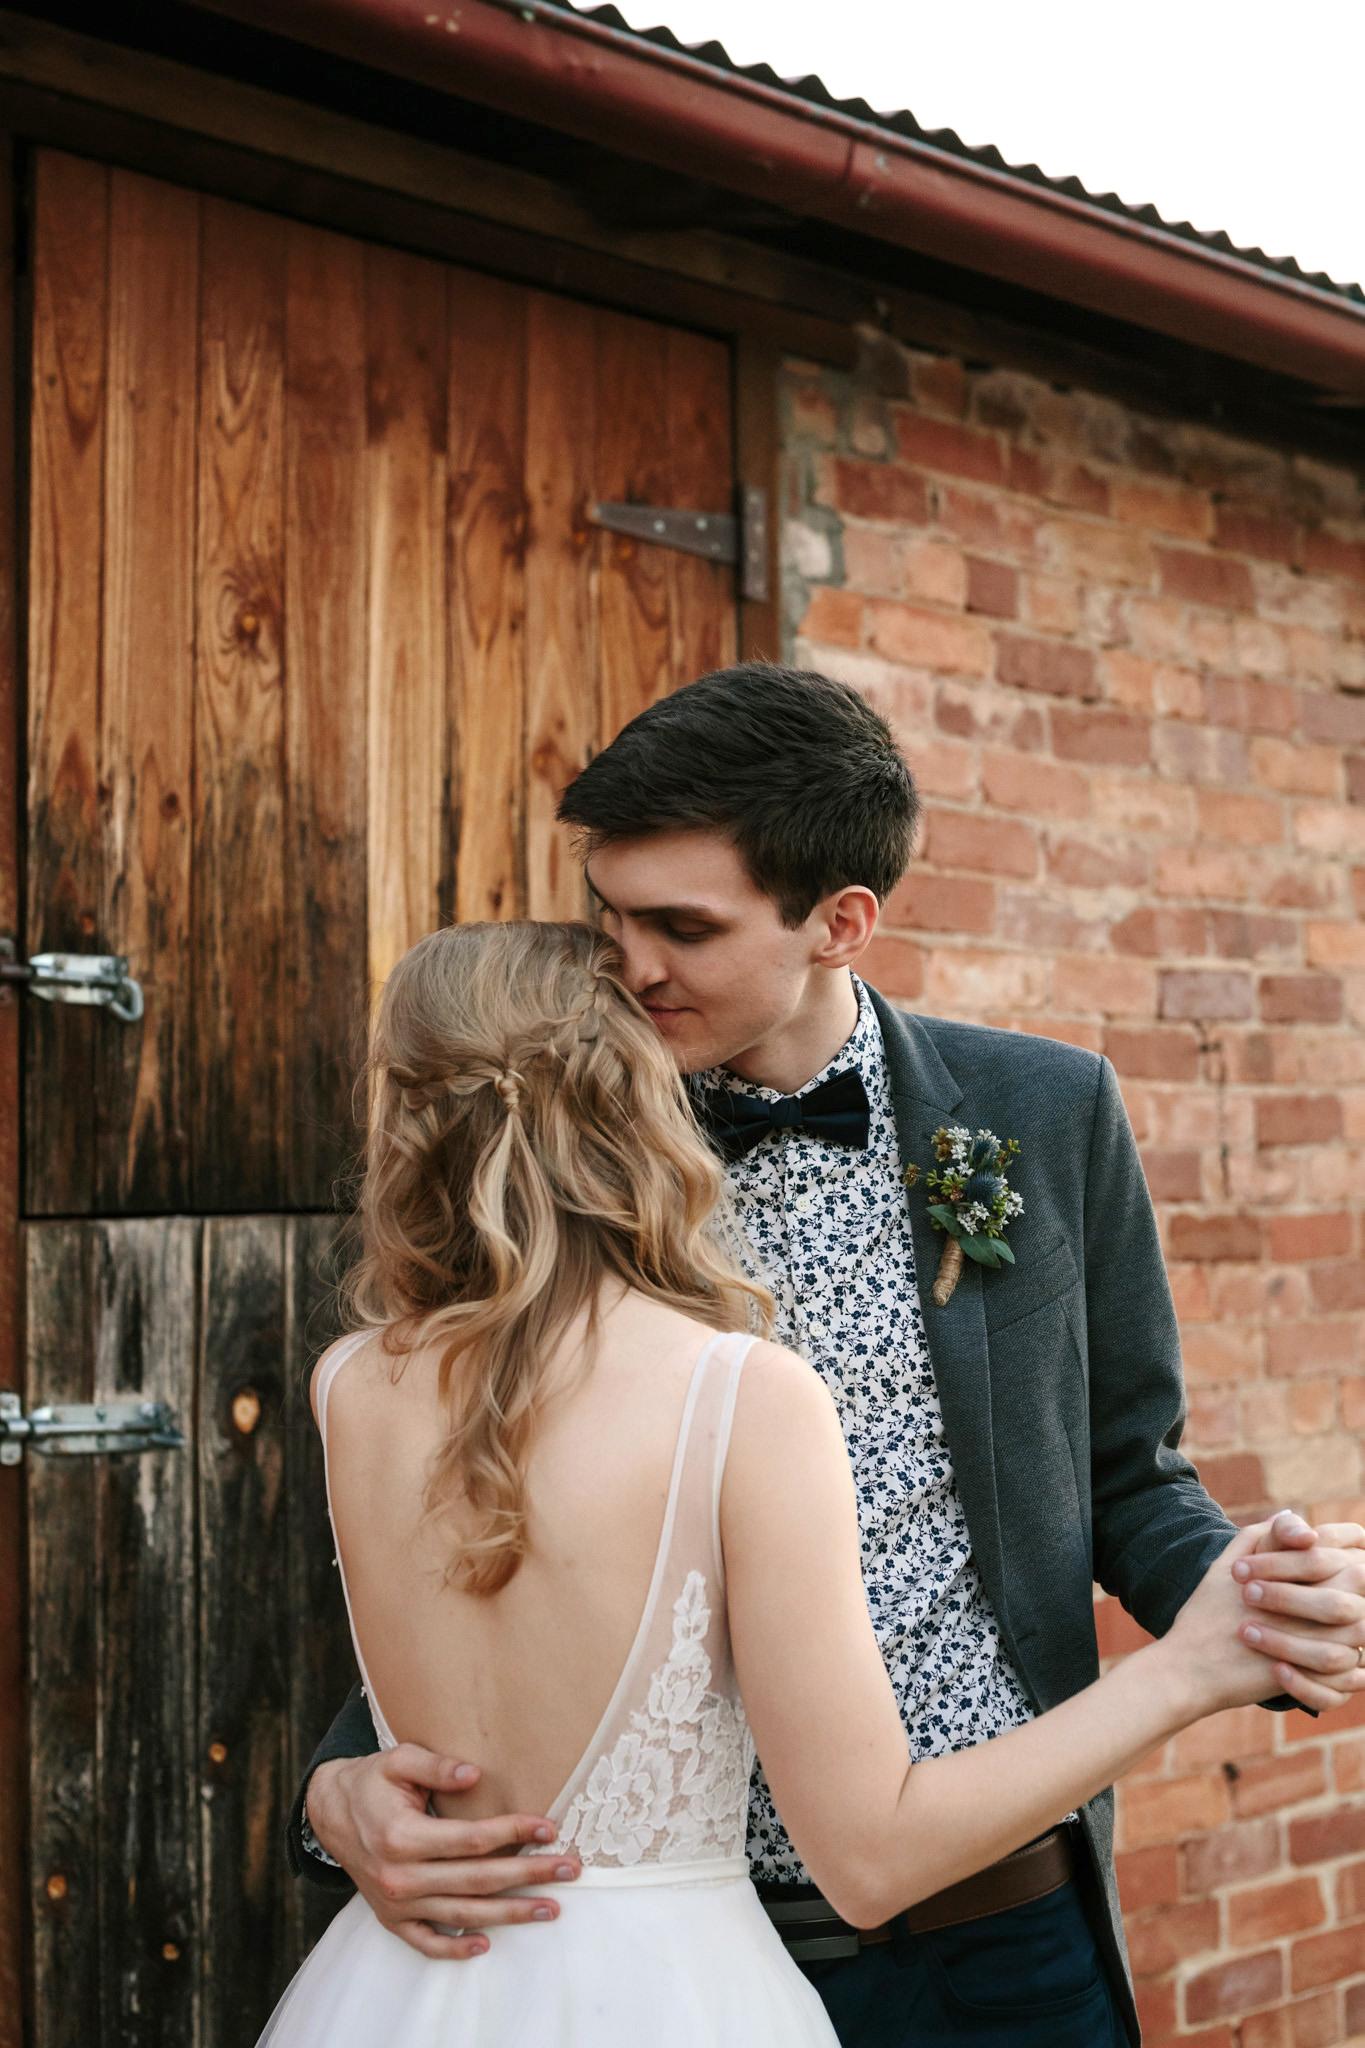 Erin_Latimore_Mudgee_Canberra_Wedding_Photographer_Tuggeranong_Homestead_525.JPG